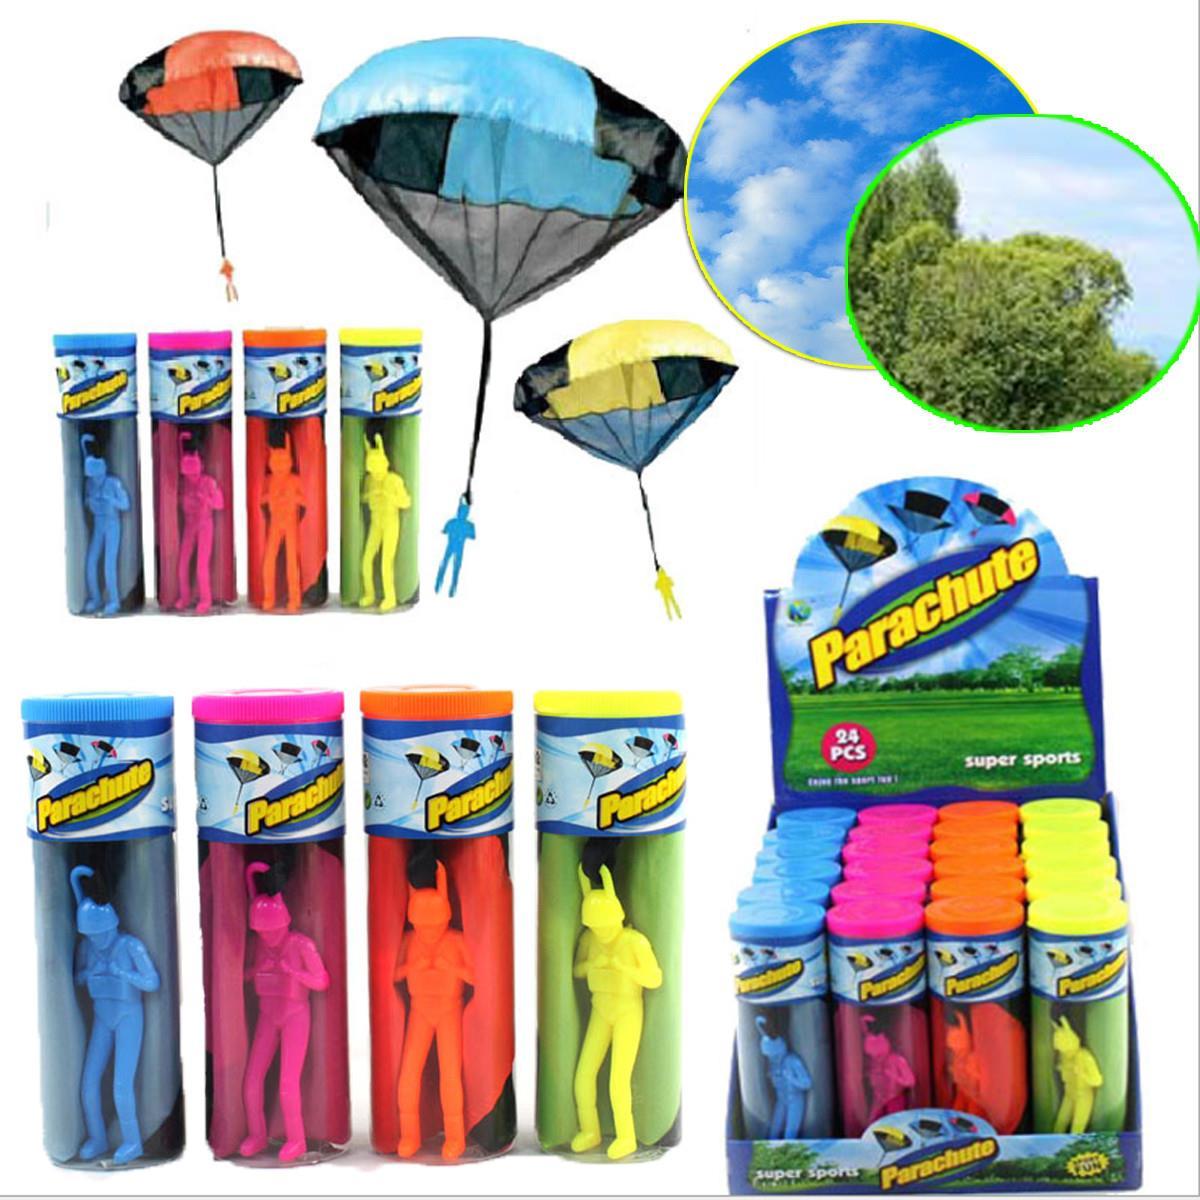 Hand Throwing parachutes Kite kids mini play parachute soldier toy Children's Educational Toys Kites free shipping(China (Mainland))